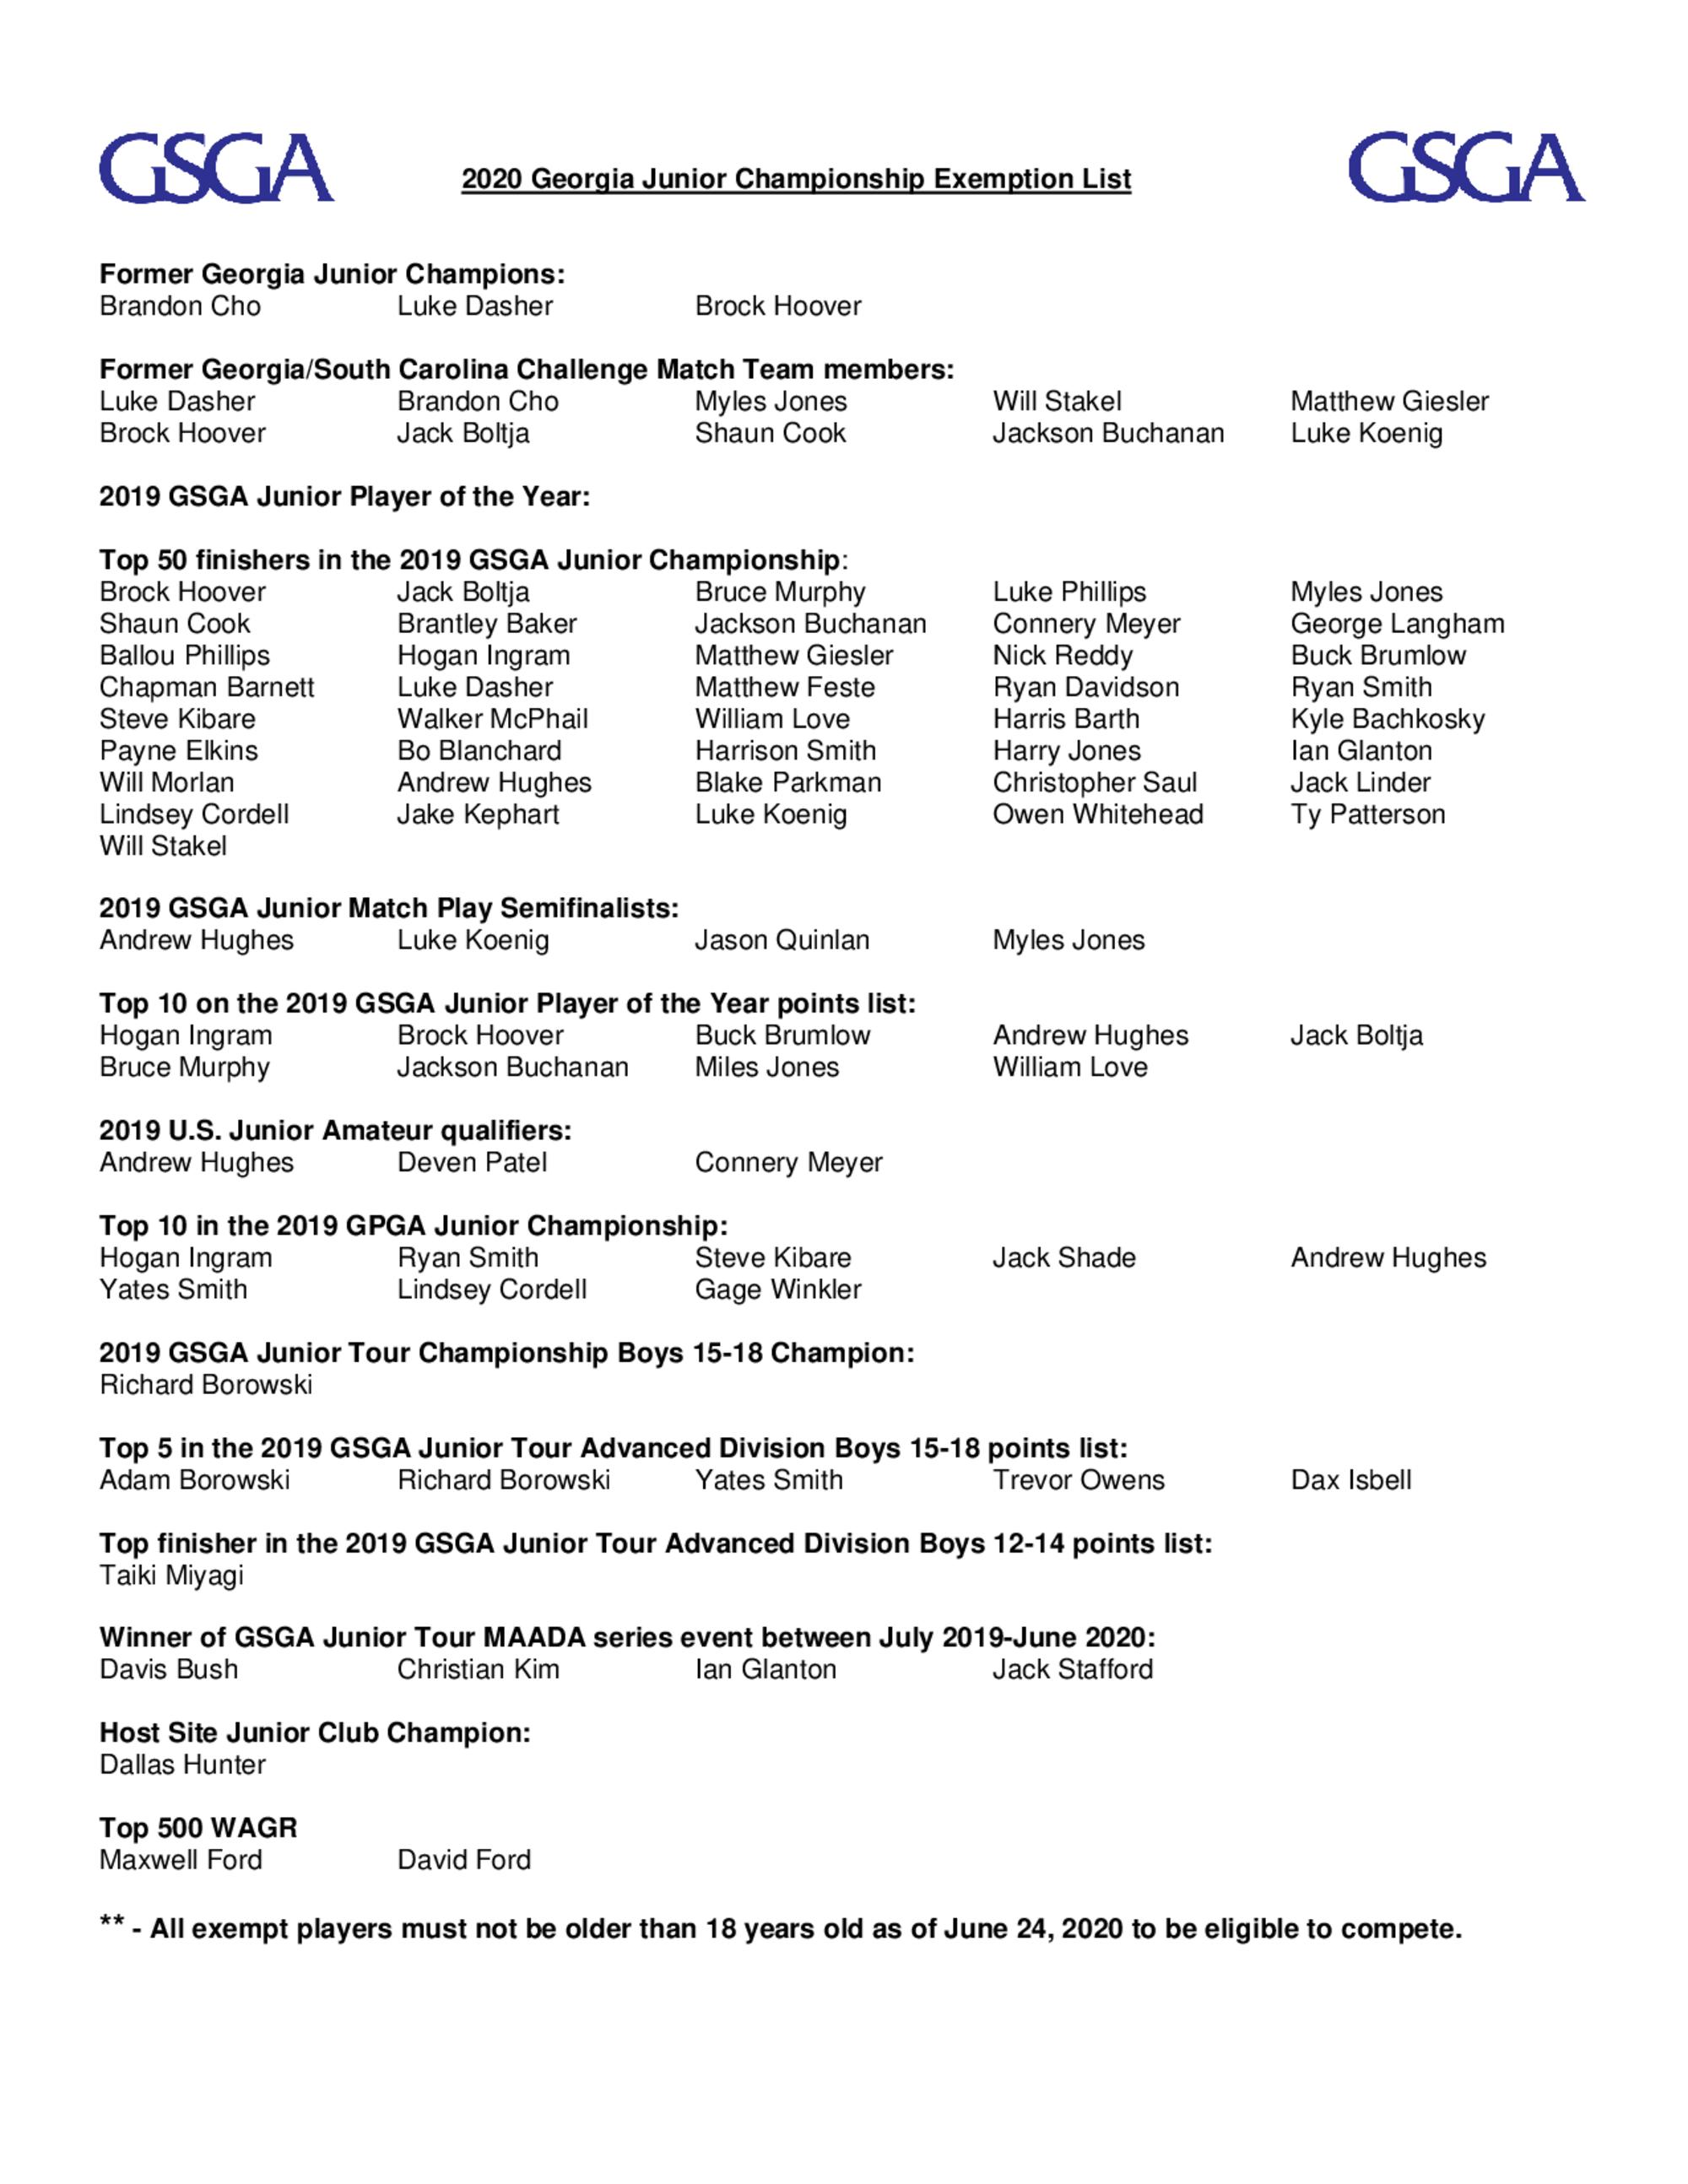 2020 junior exemption list 1